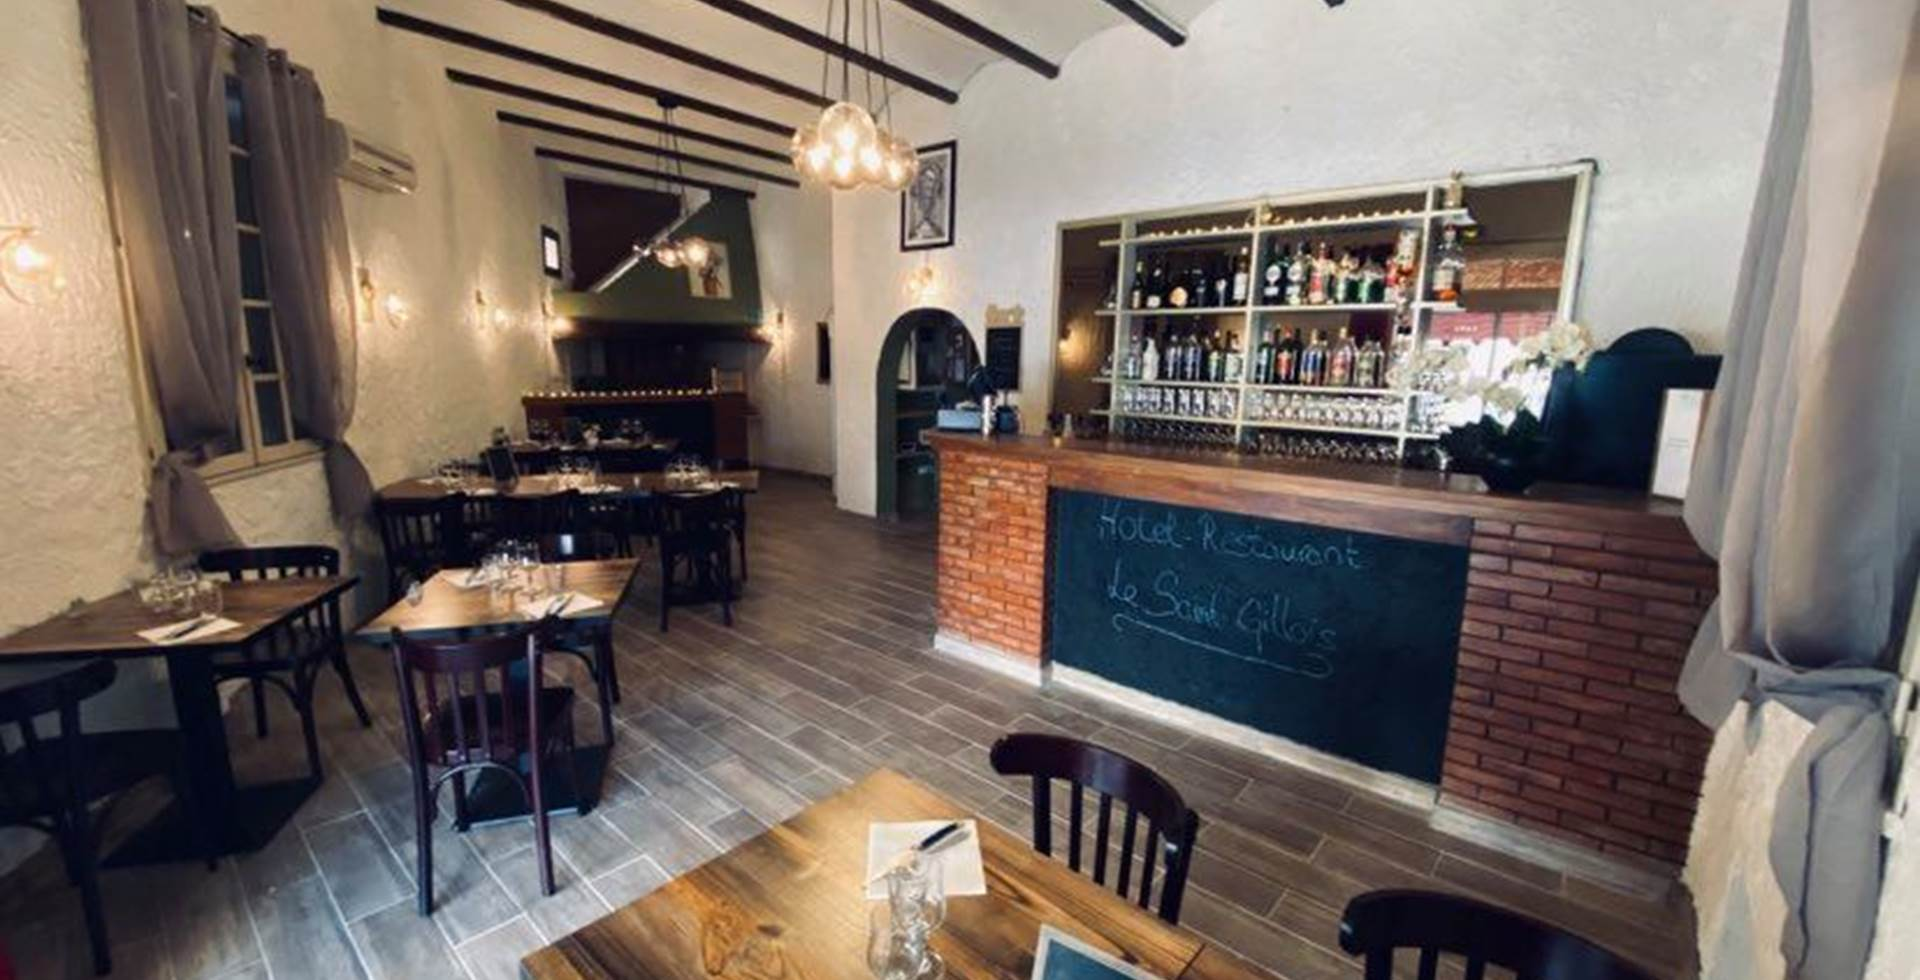 restaurantsaintgilles7